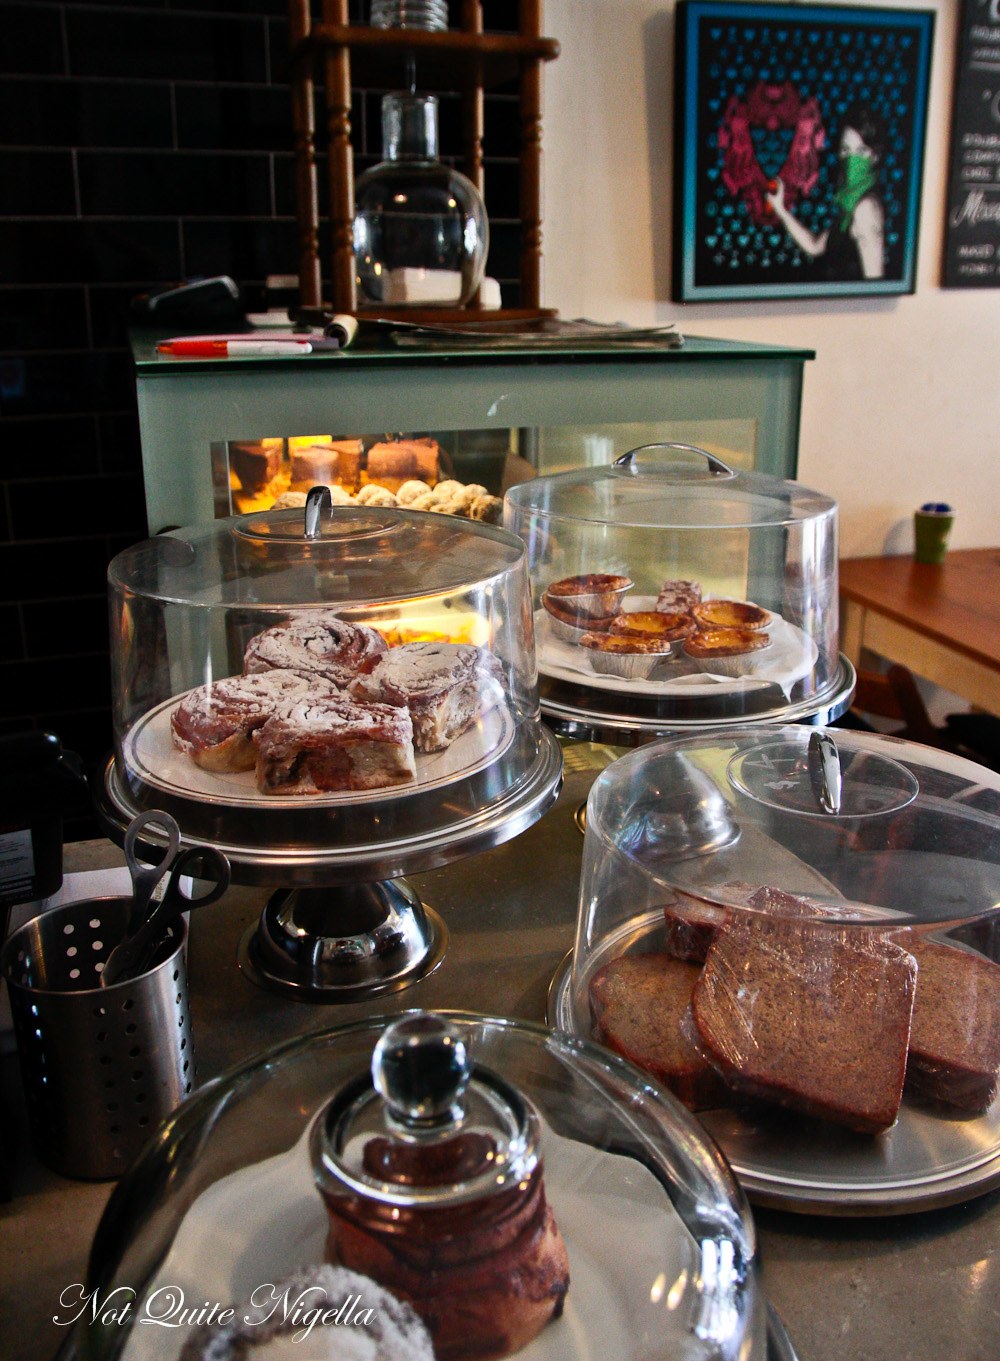 Fernside Coffee Shoppe